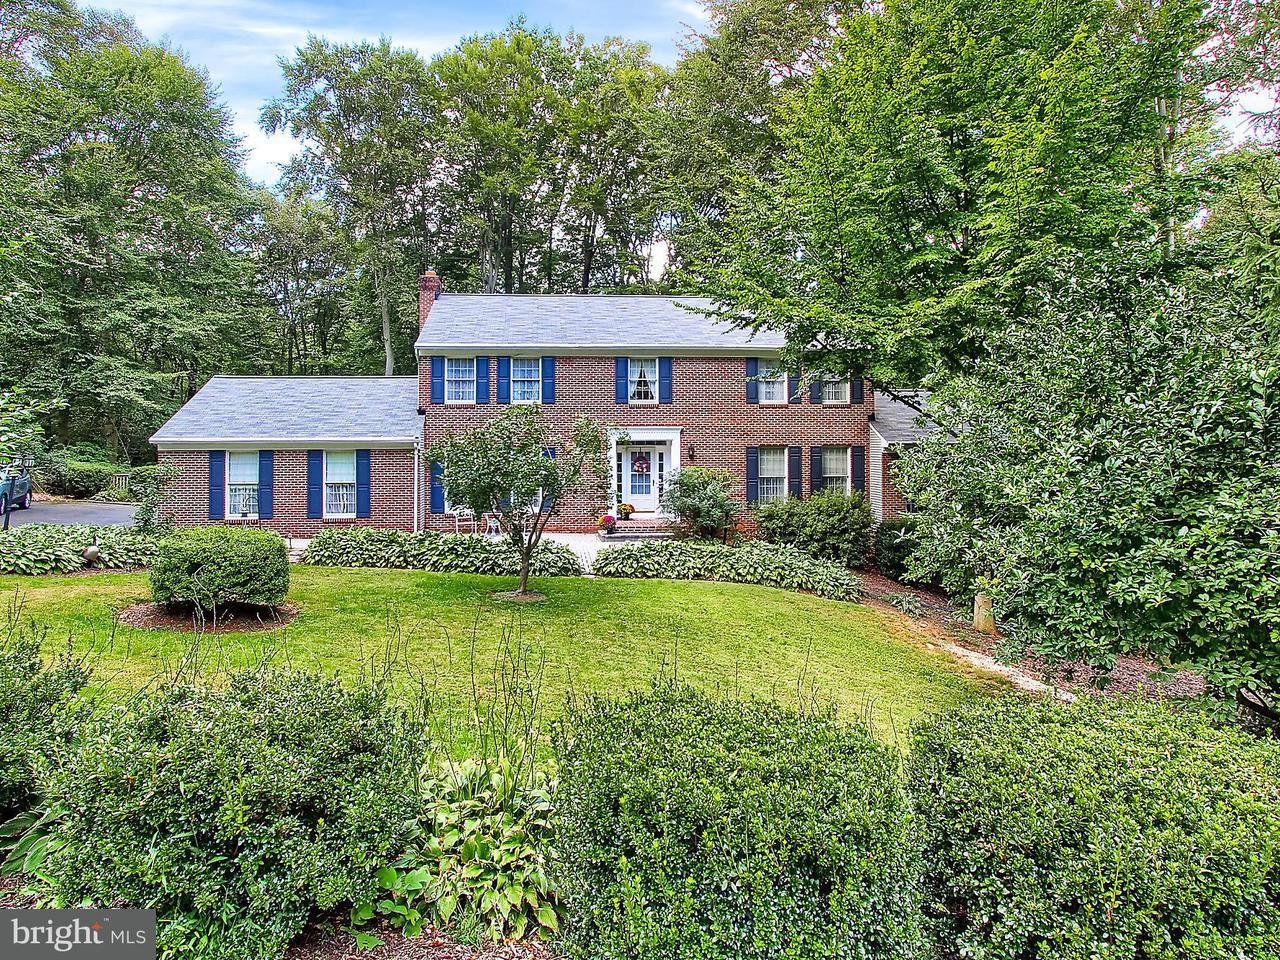 Single Family Home for Sale at 2008 FALLSGROVE WAY 2008 FALLSGROVE WAY Fallston, Maryland 21047 United States